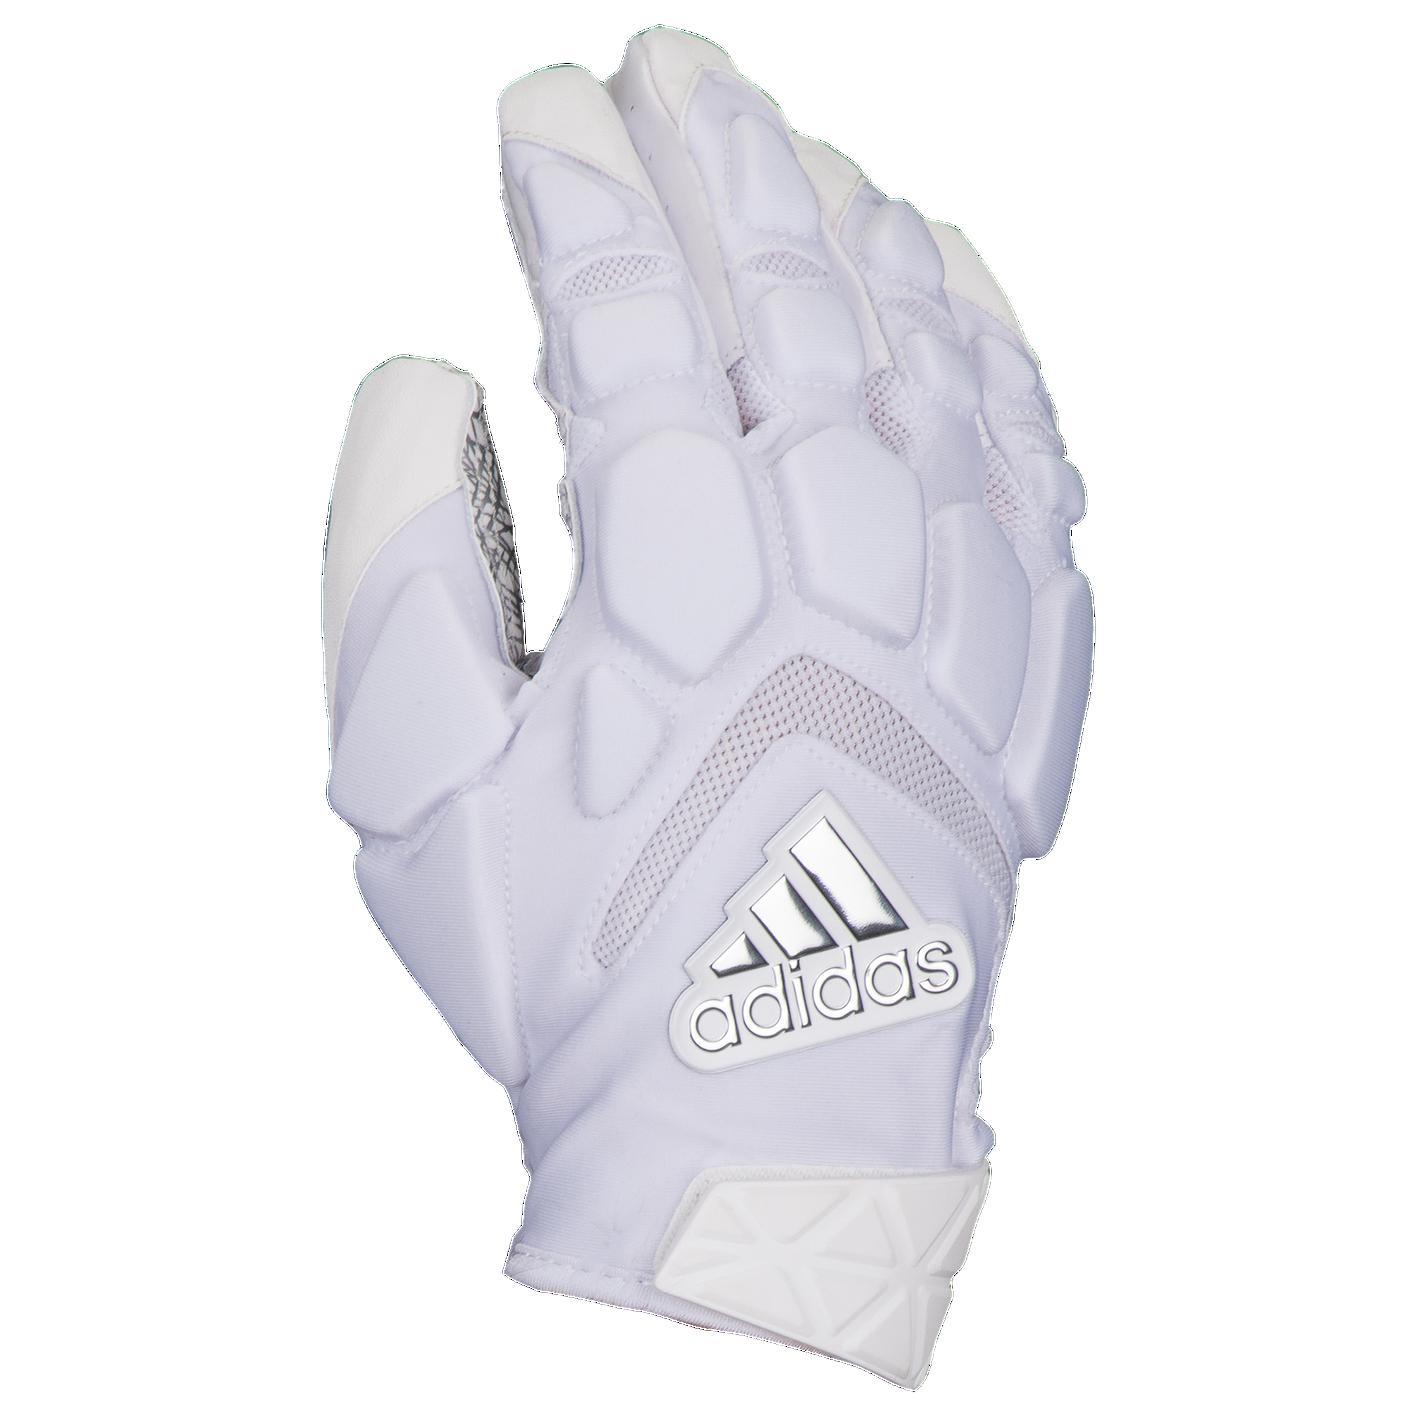 b6a8db7356c adidas Freak Max Lineman Gloves - Men s - Football - Sport Equipment ...